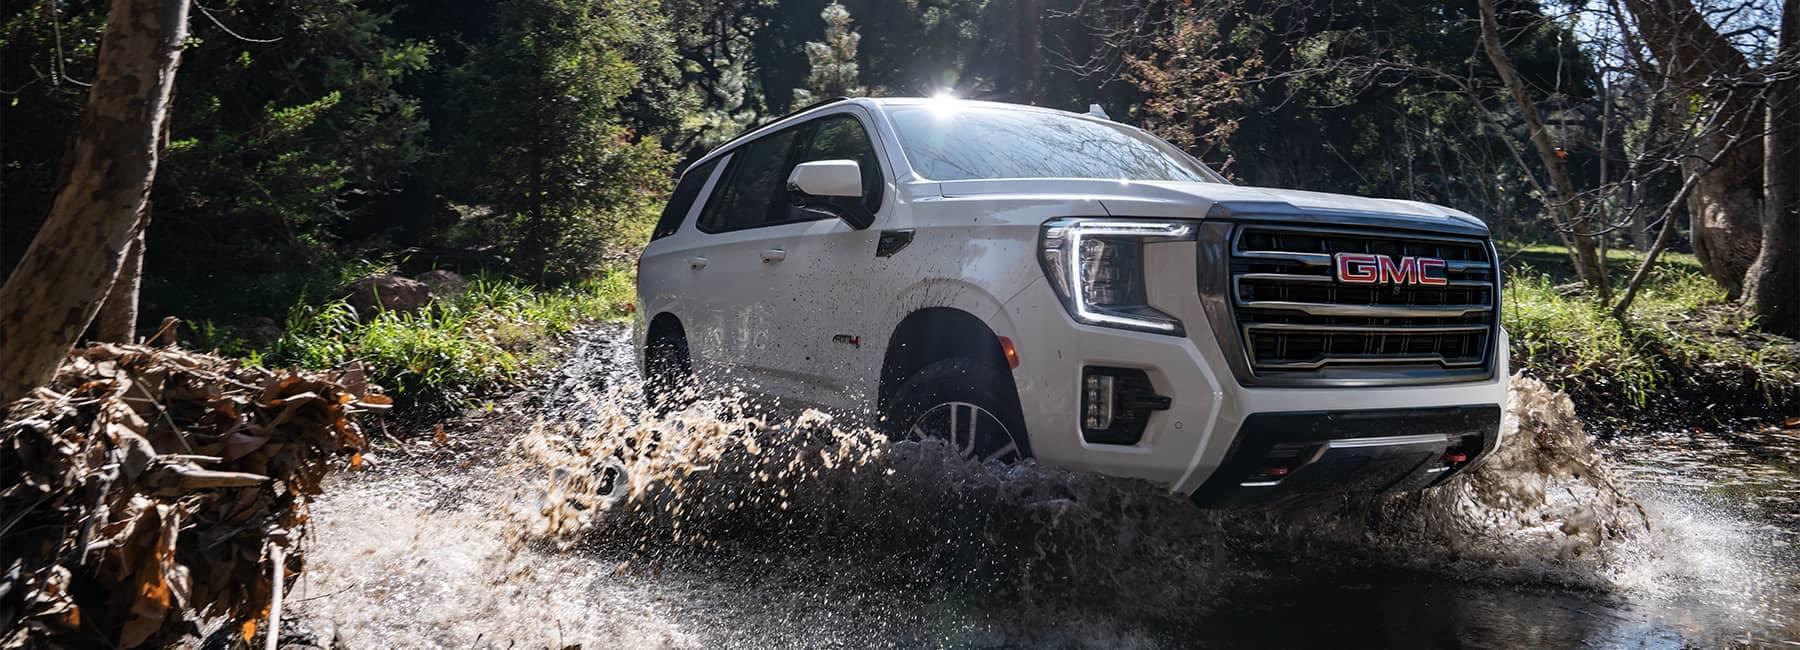 2021 Summit White GMC Yukon AT4 4WD driving through a forest stream